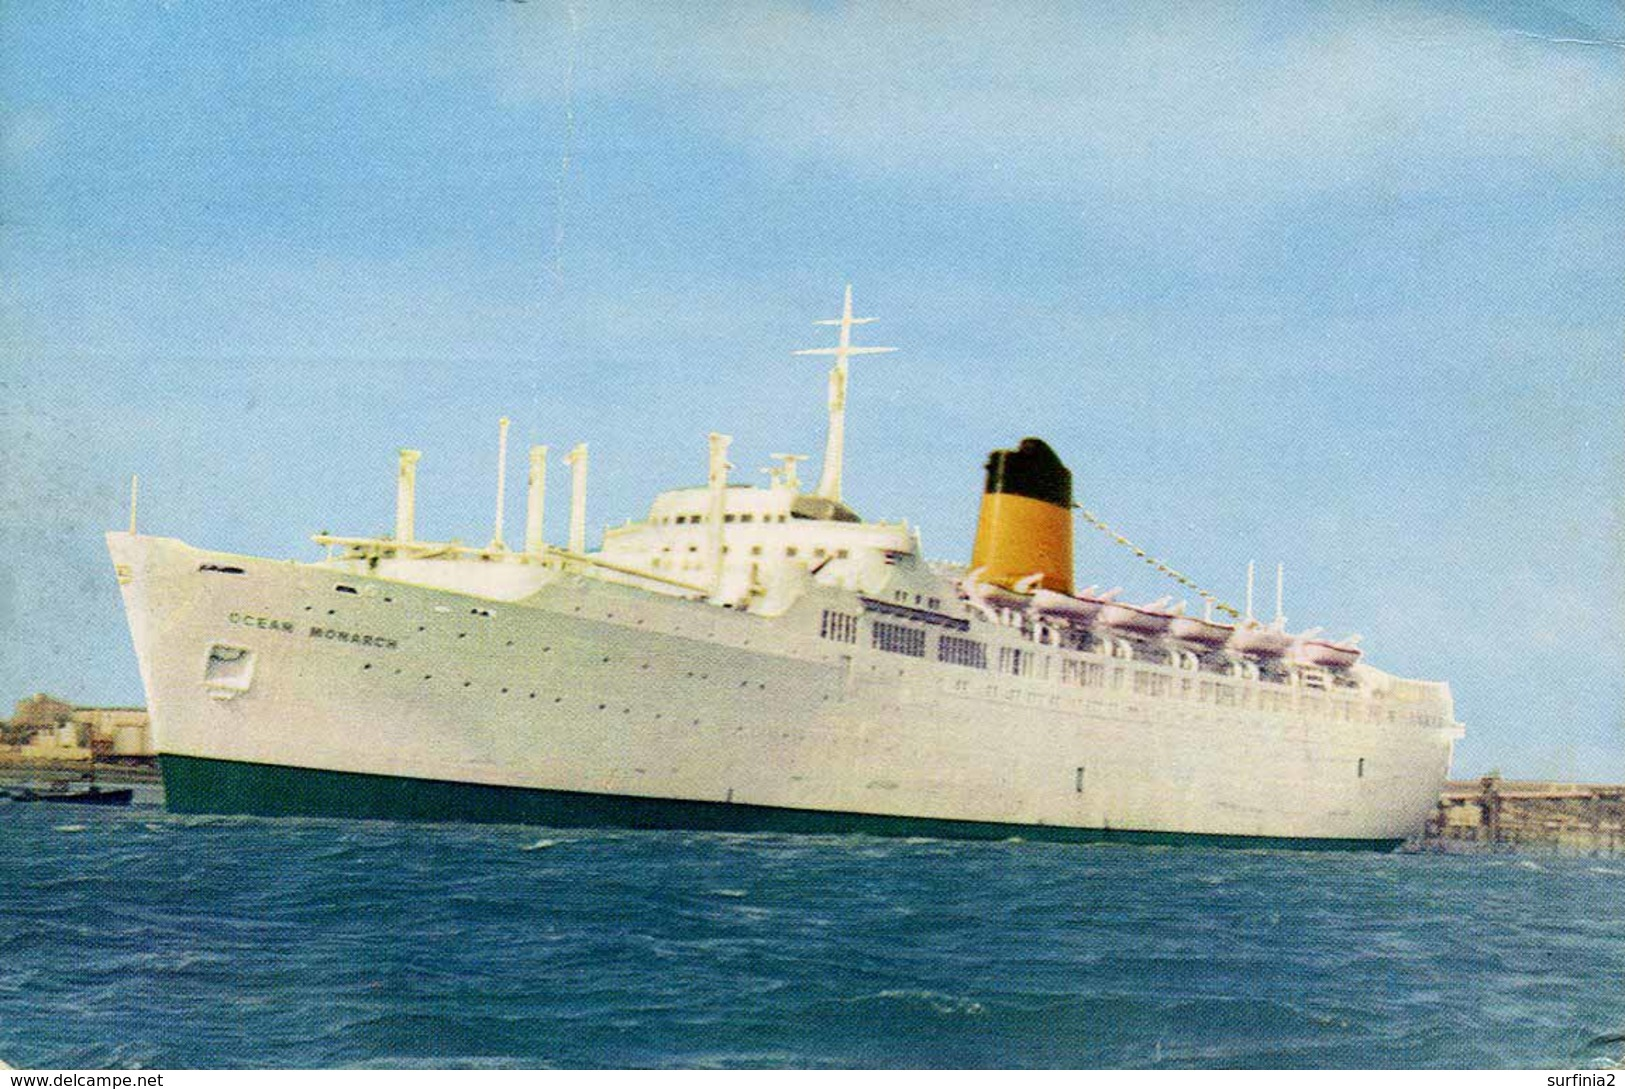 SHIPPING - SHAW SAVILL LINE - SS OCEAN MONARCH Ship94 - Steamers